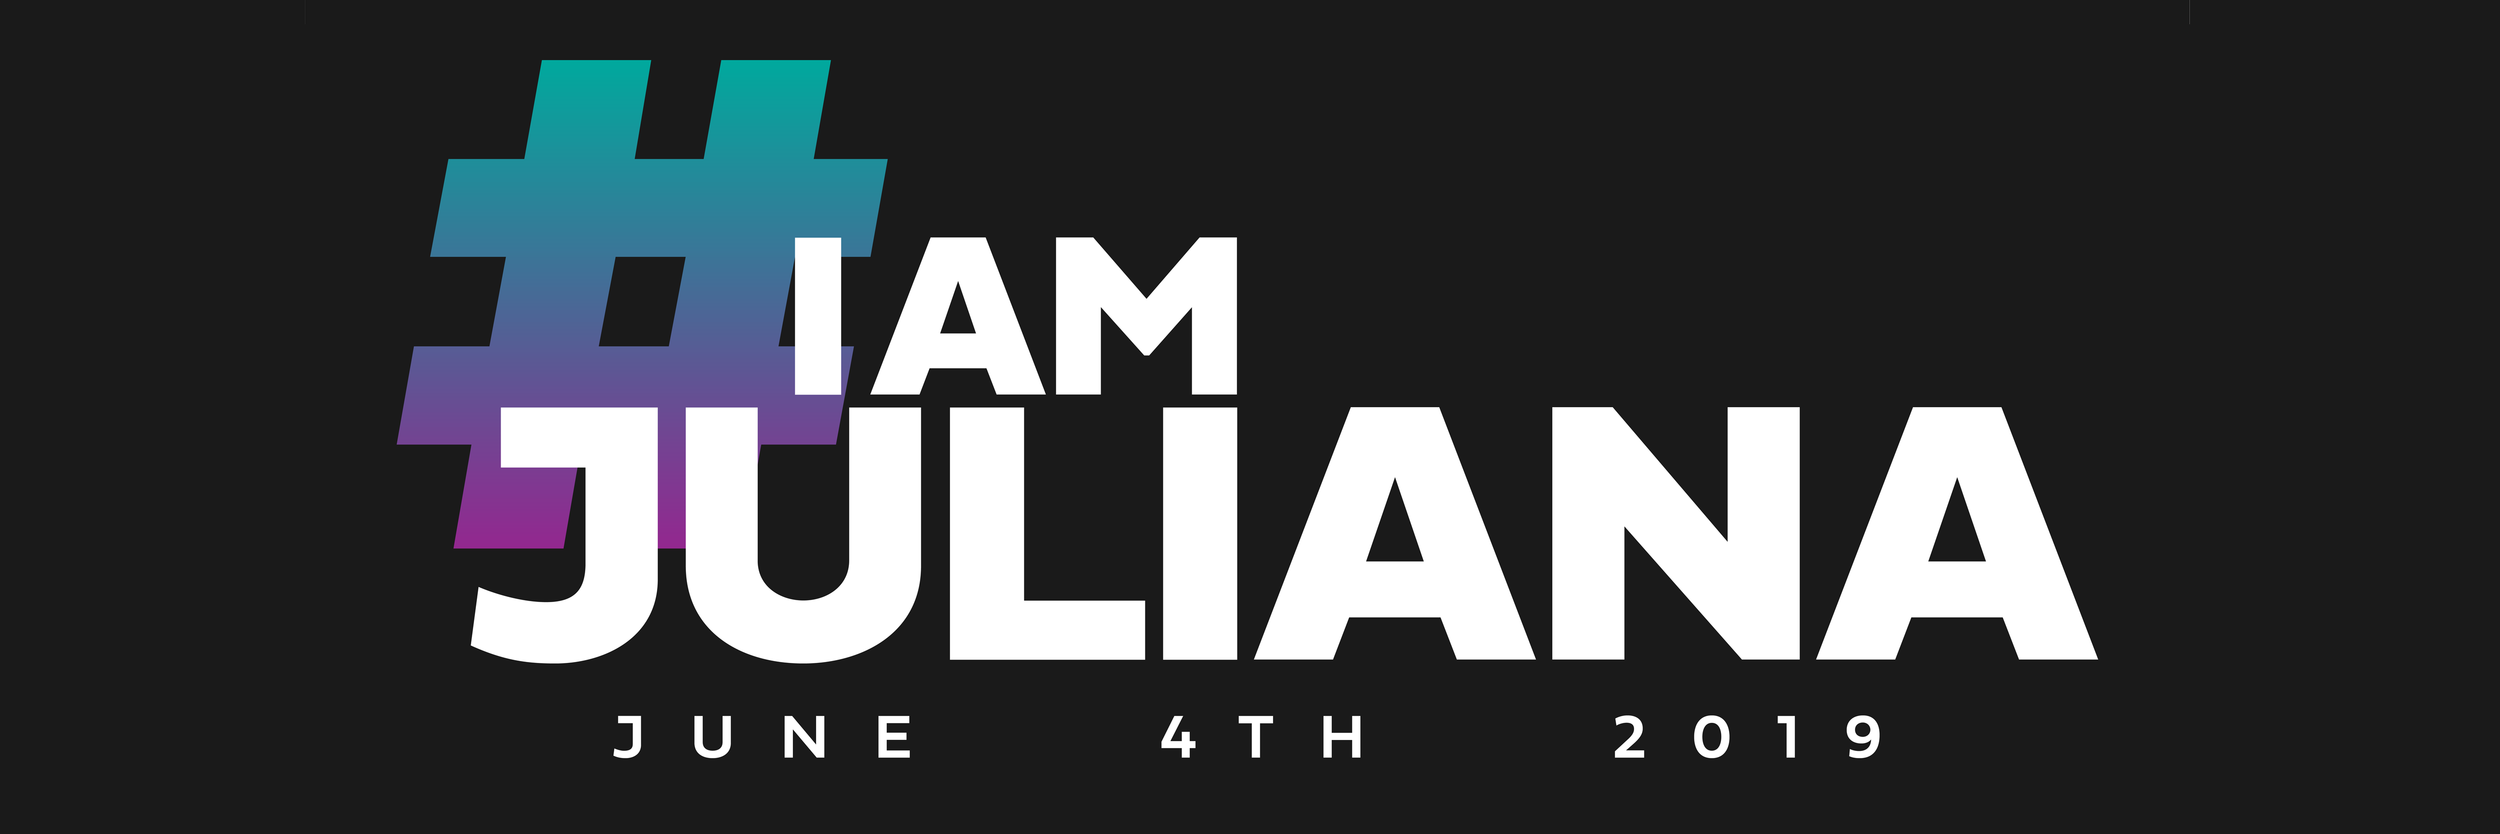 Juliana-AN-PageWrapper.png